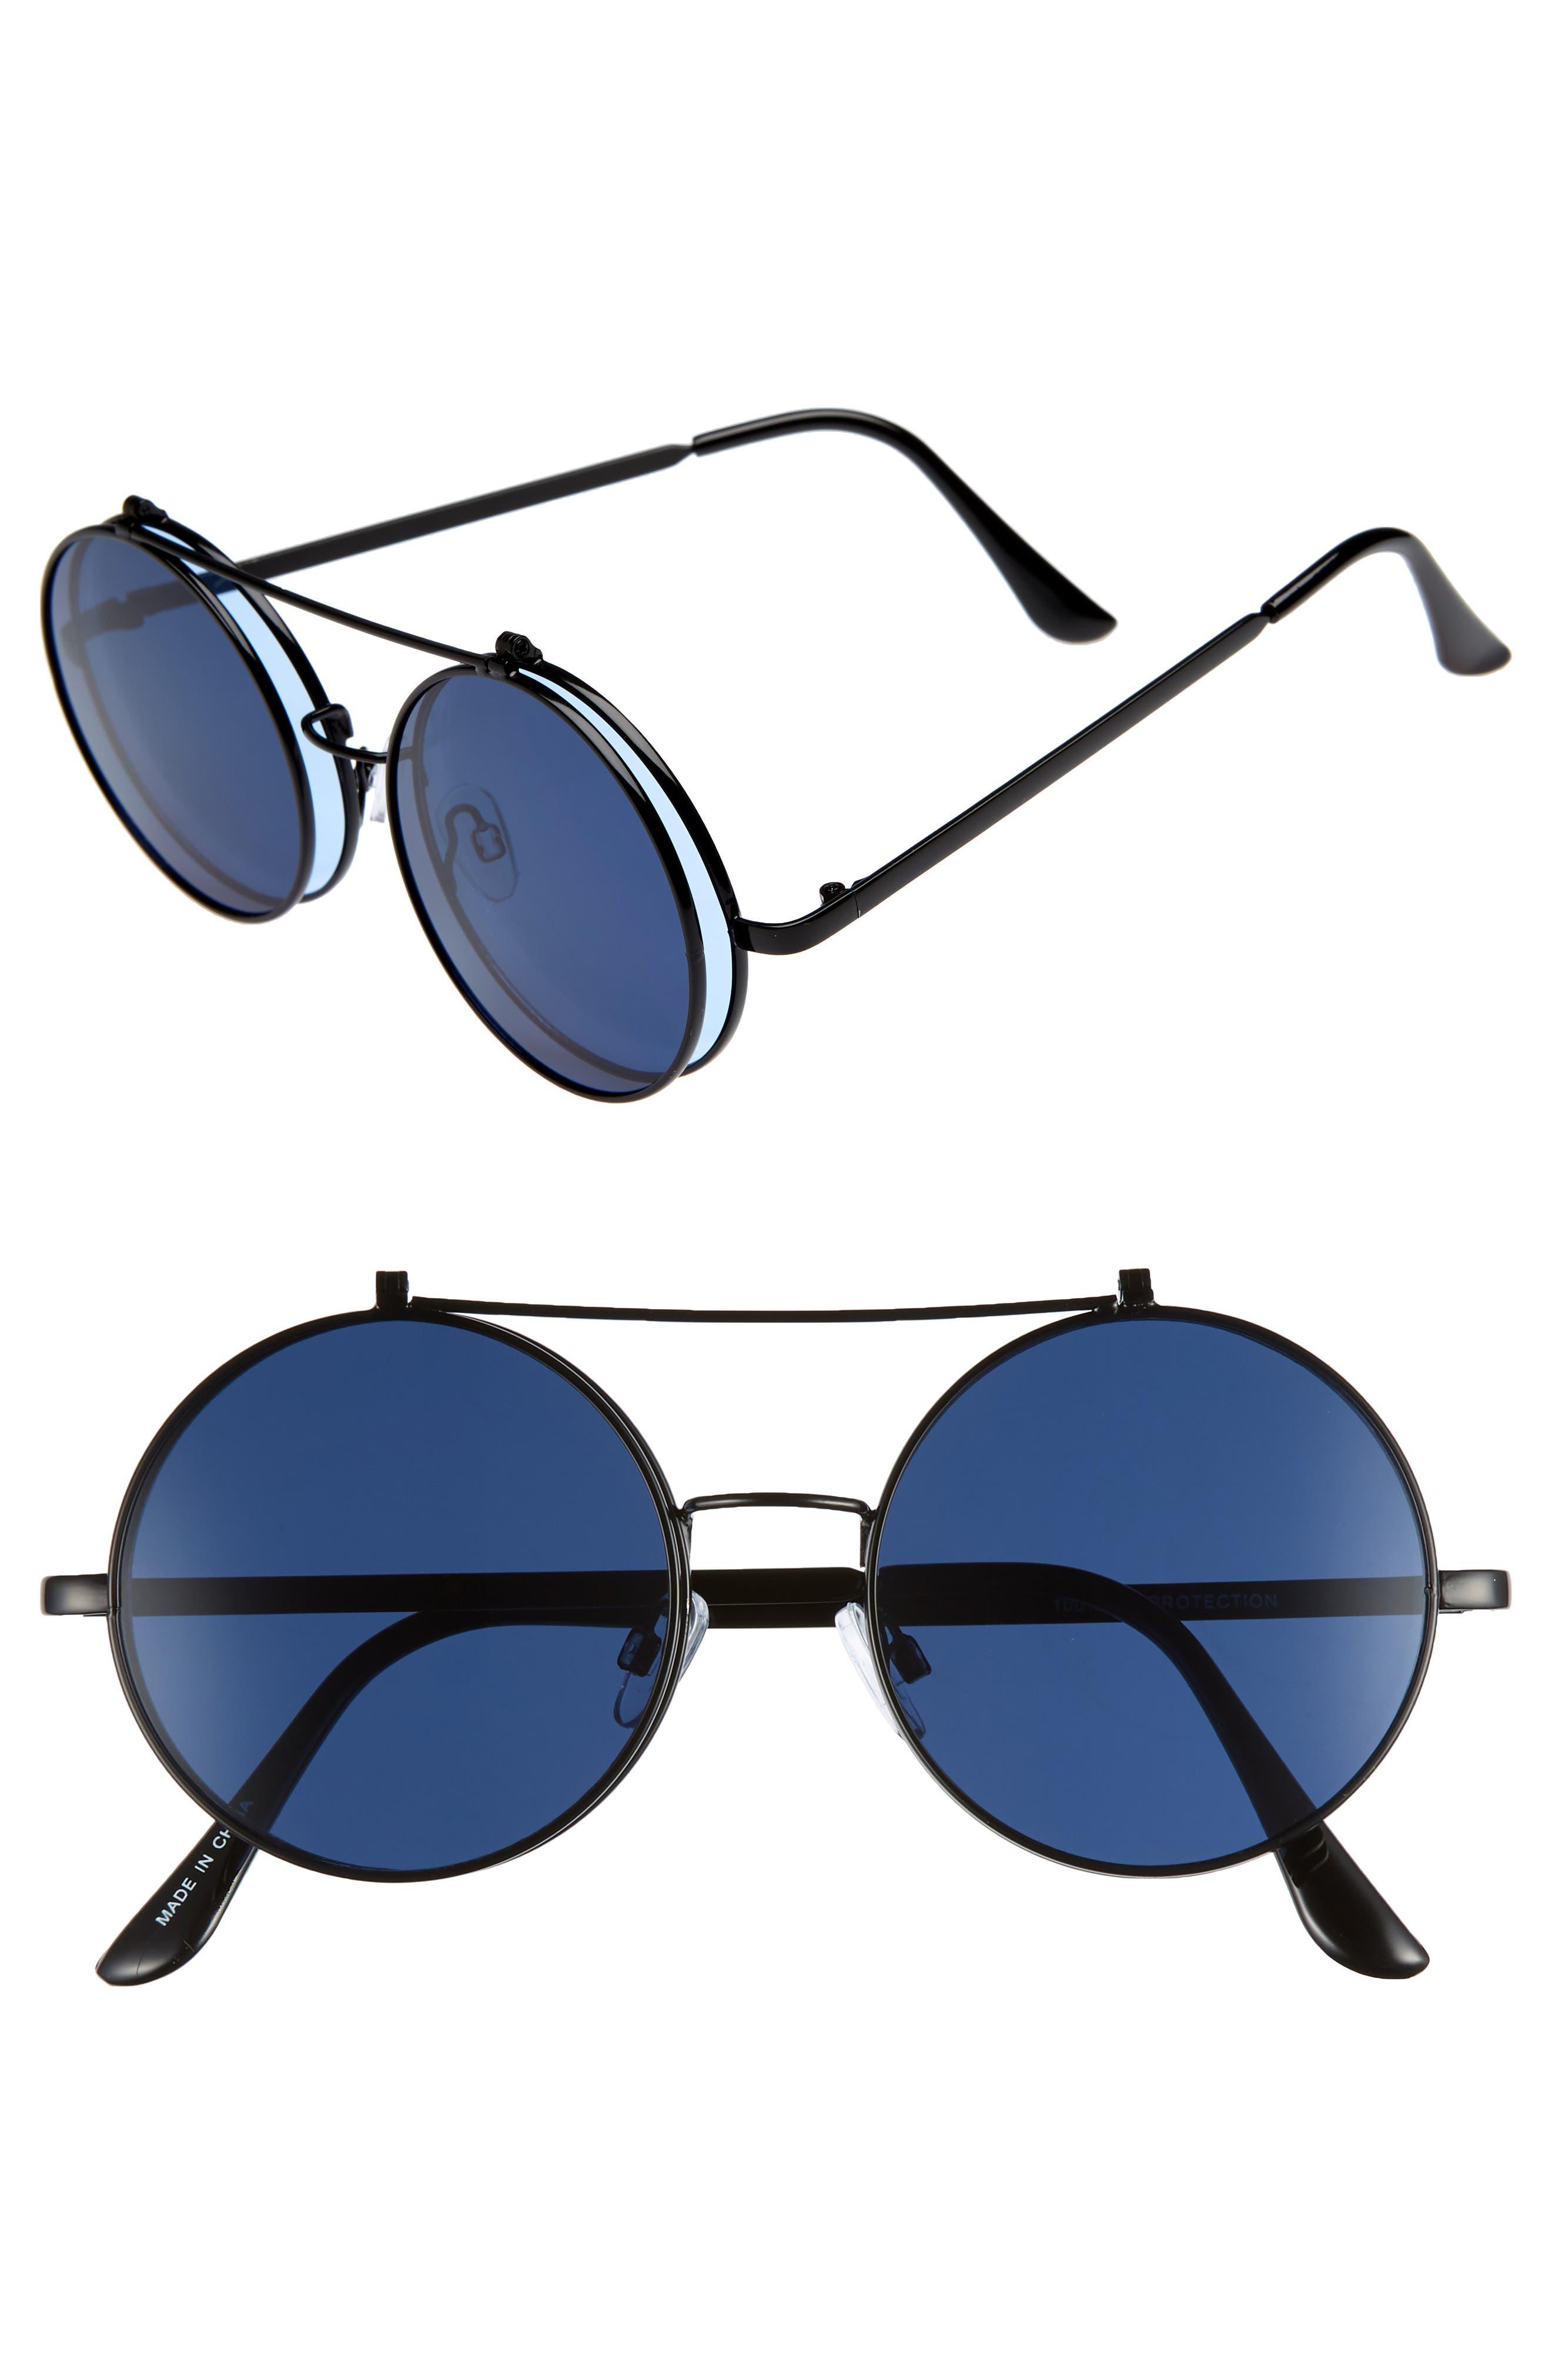 50mm Round Flip-Up Sunglasses,                         Main,                         color, BLACK/ BLUE